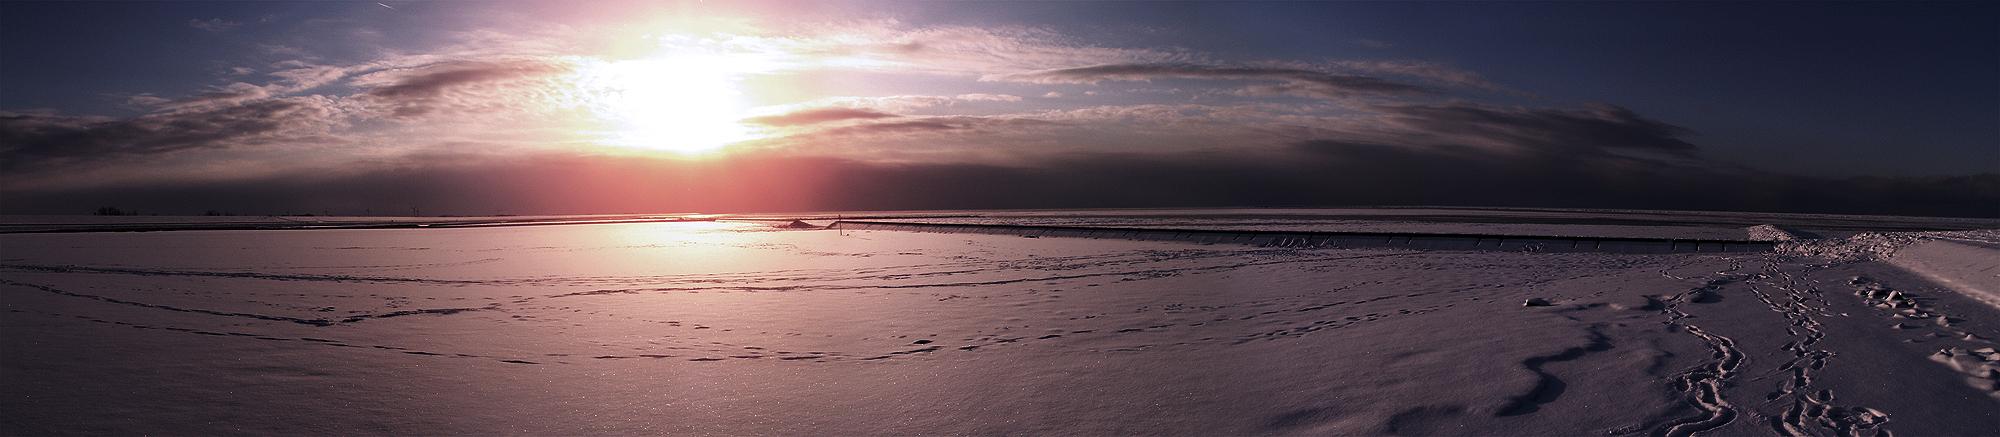 Nordsee on ice (rework)